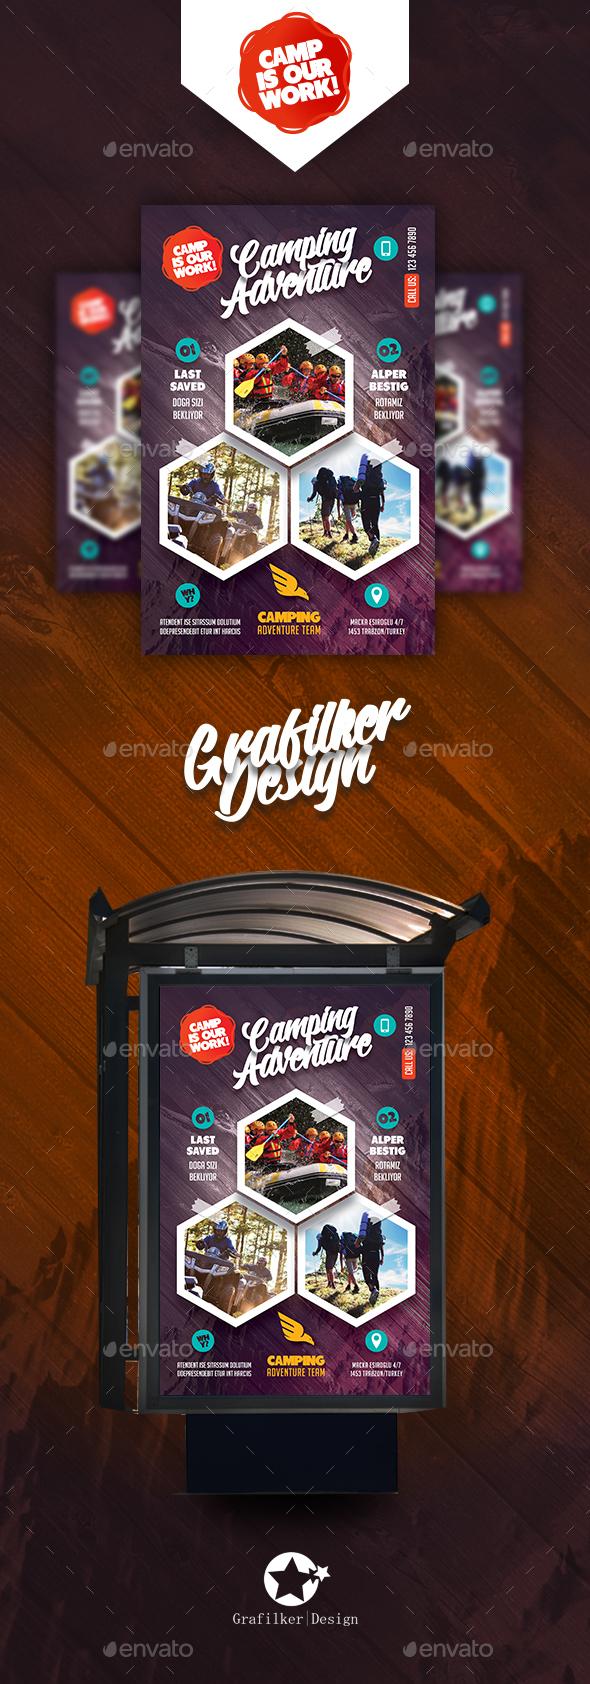 Camping Adventure Poster Templates - Signage Print Templates